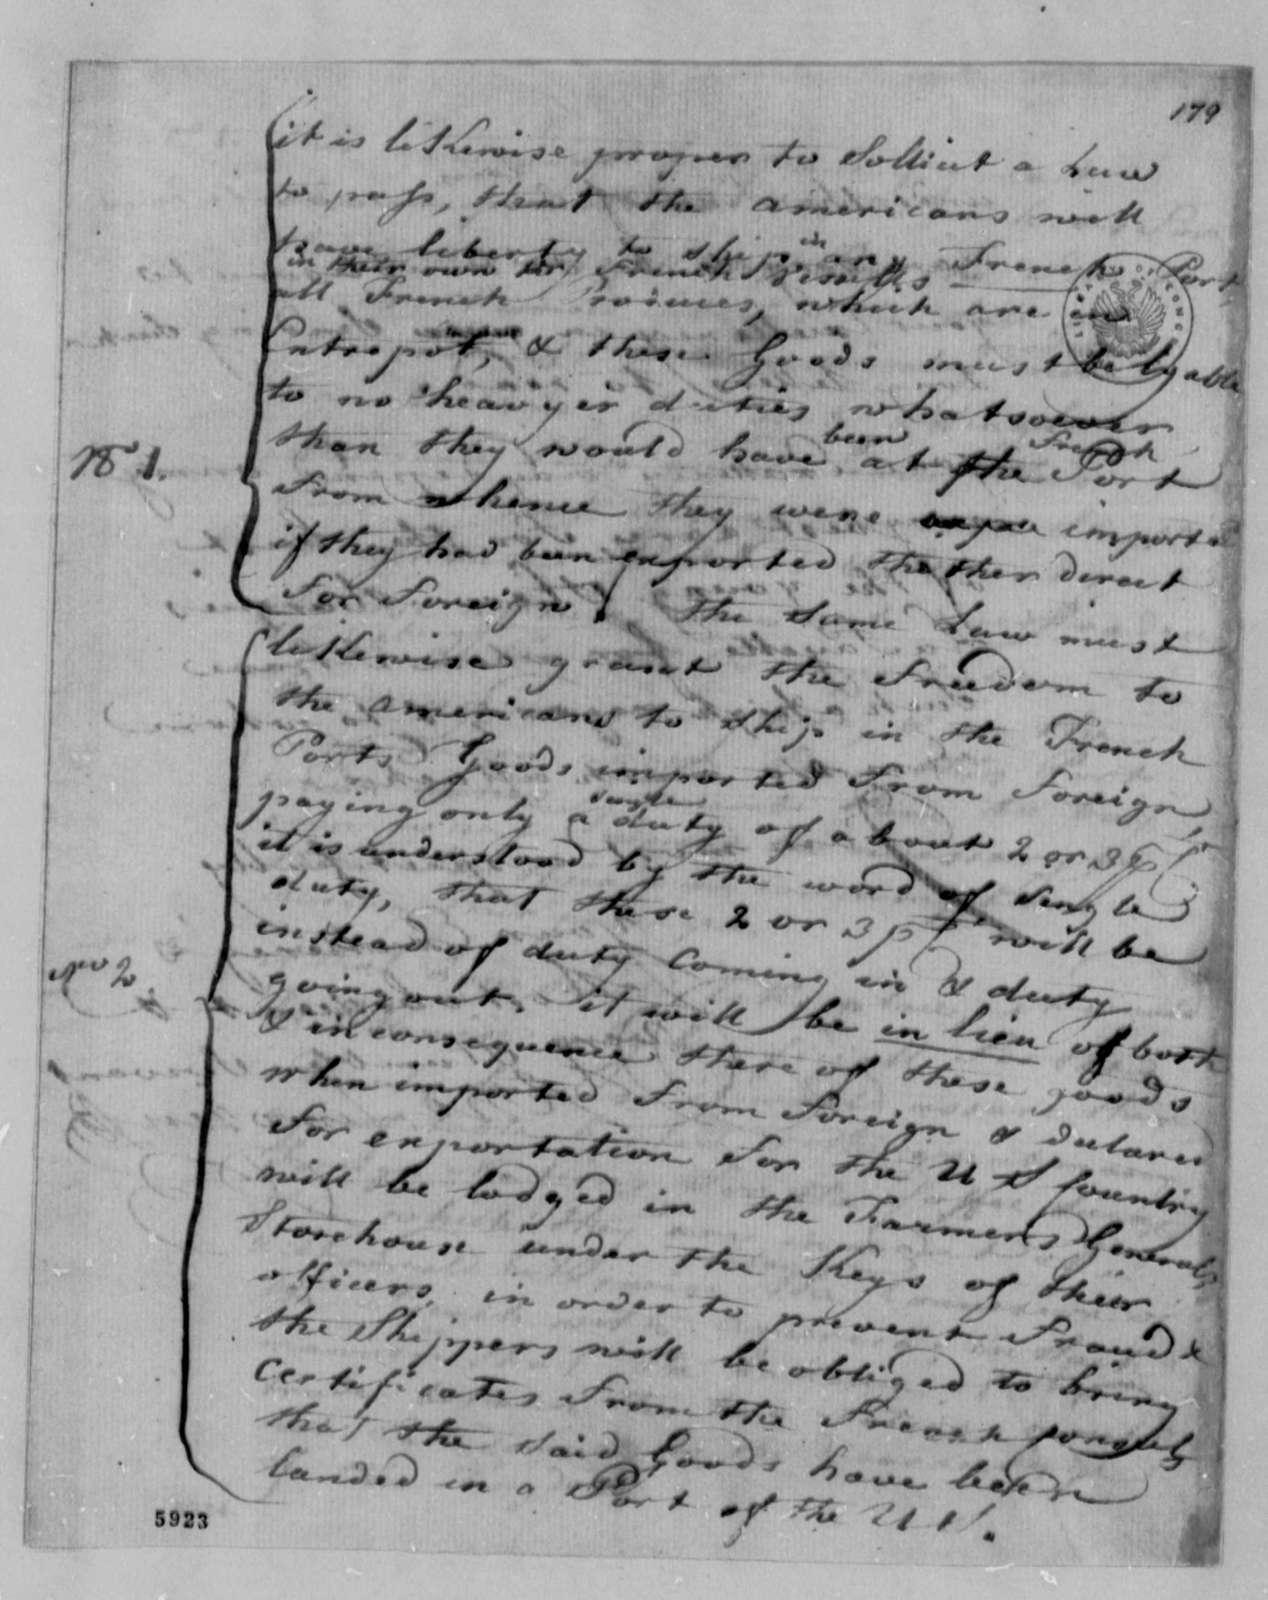 Andre Limozin to Thomas Jefferson, November 18, 1787